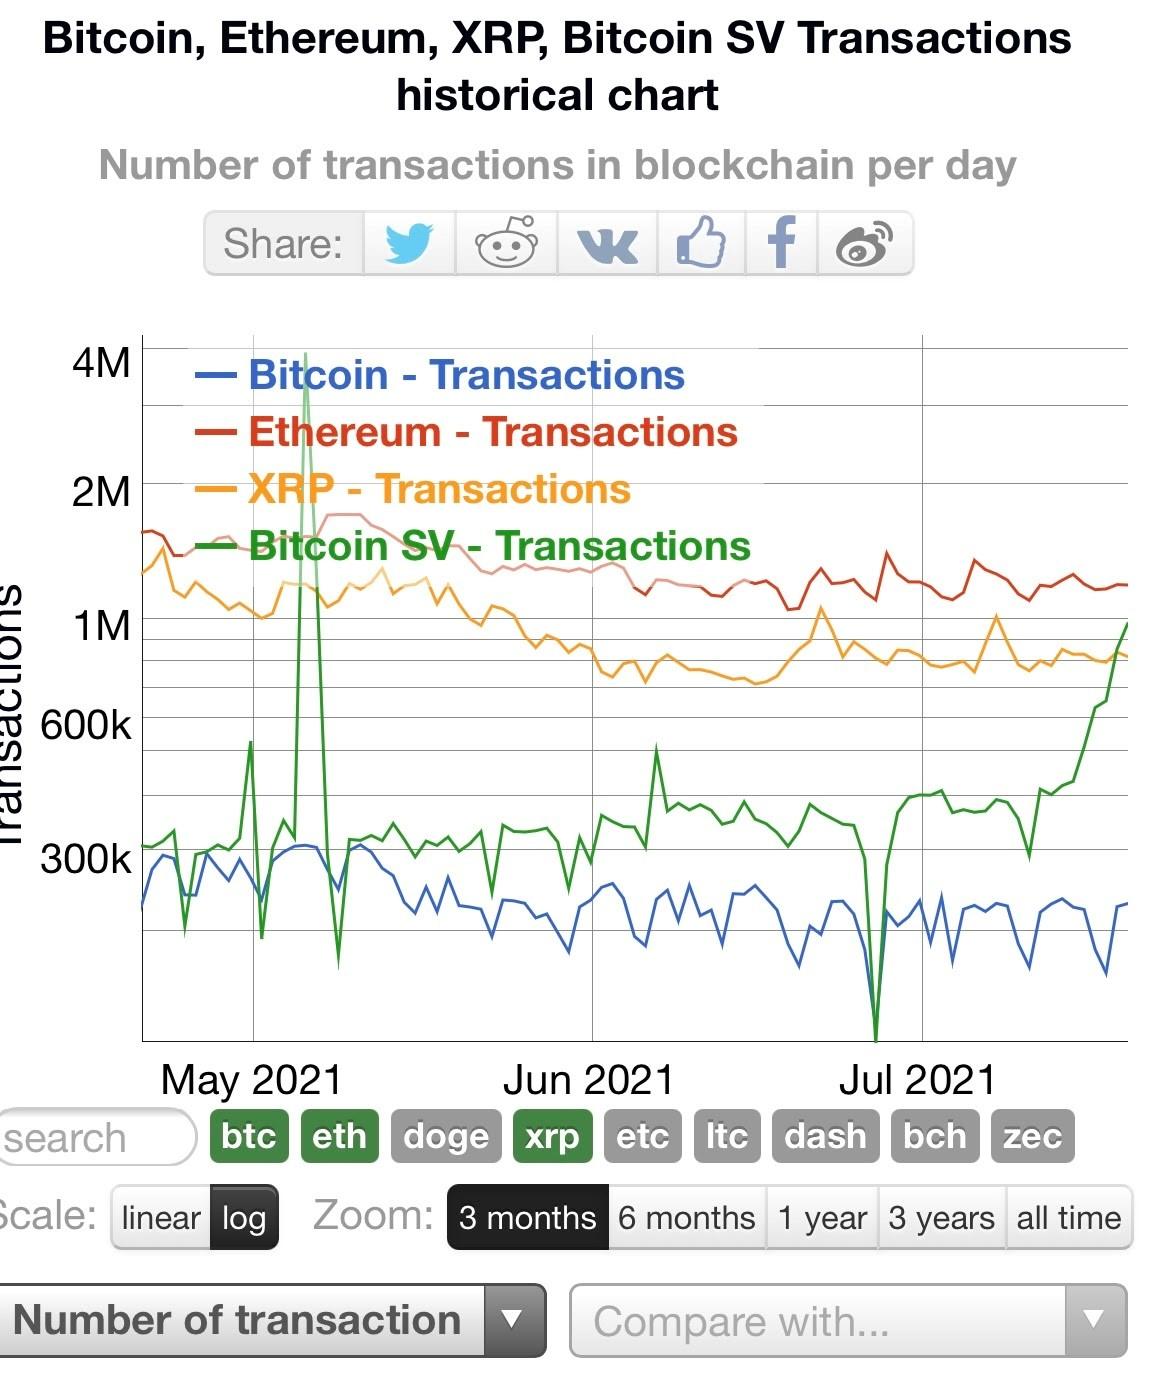 CryptoKitties, meet CryptoFights